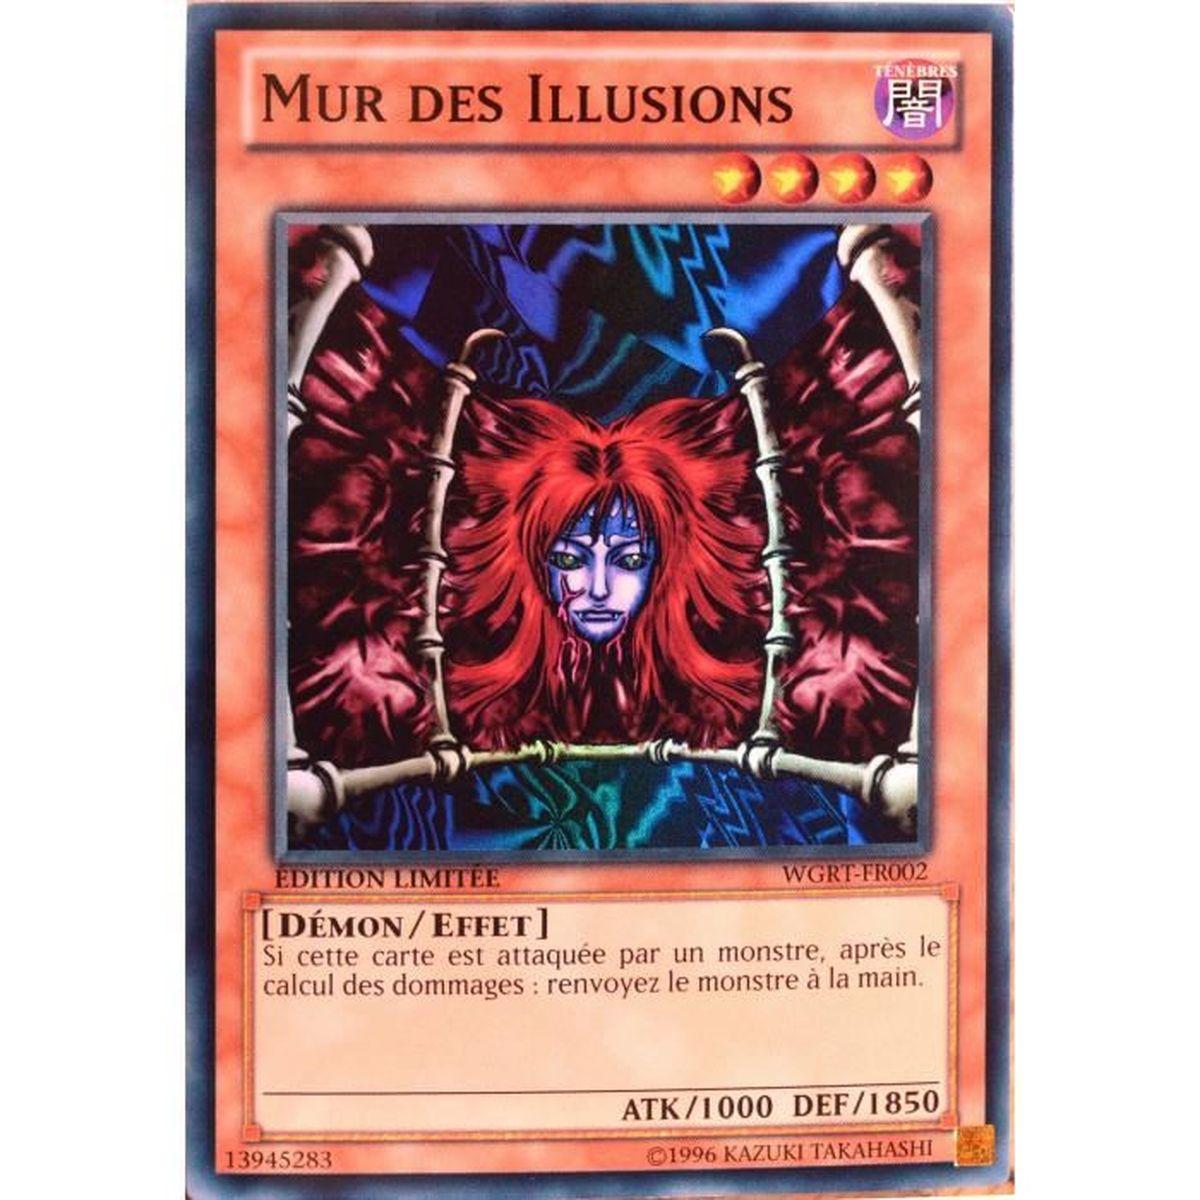 vente carte yu gi oh Carte YU GI OH WGRT FR002 Mur Des Illusions   Achat / Vente carte